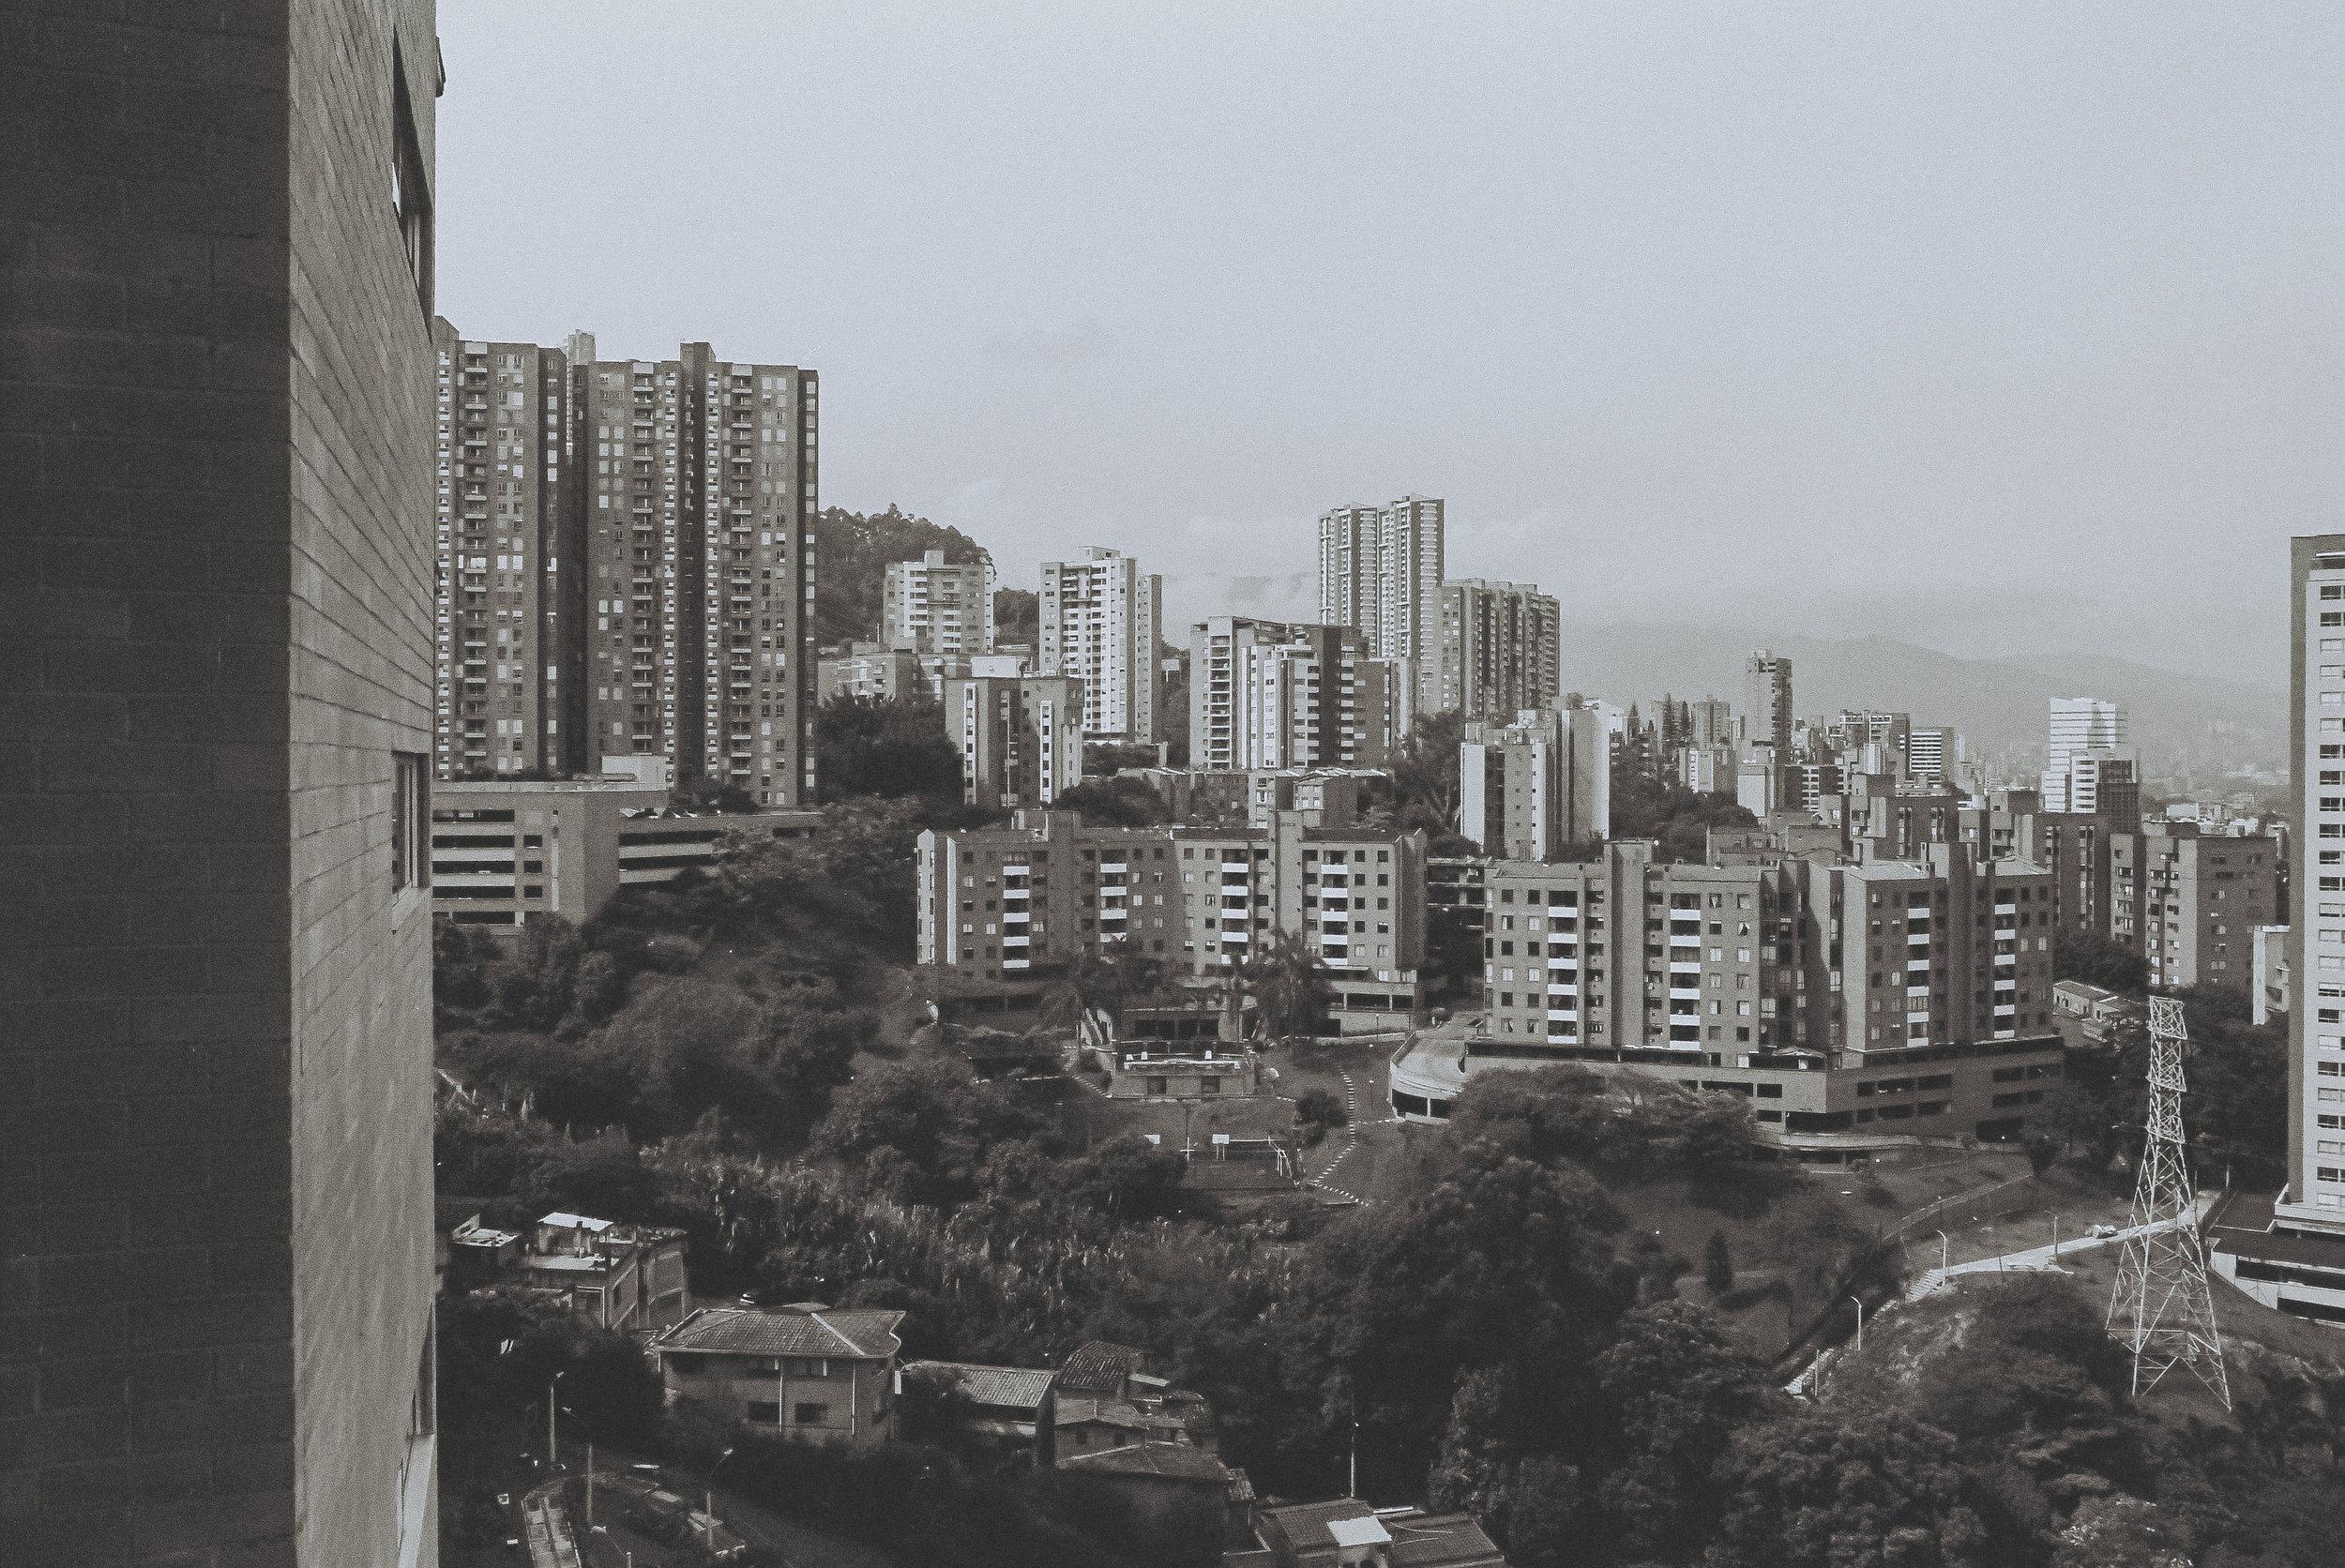 The skyline of El Poblado, my new favorite neighborhood in South America.